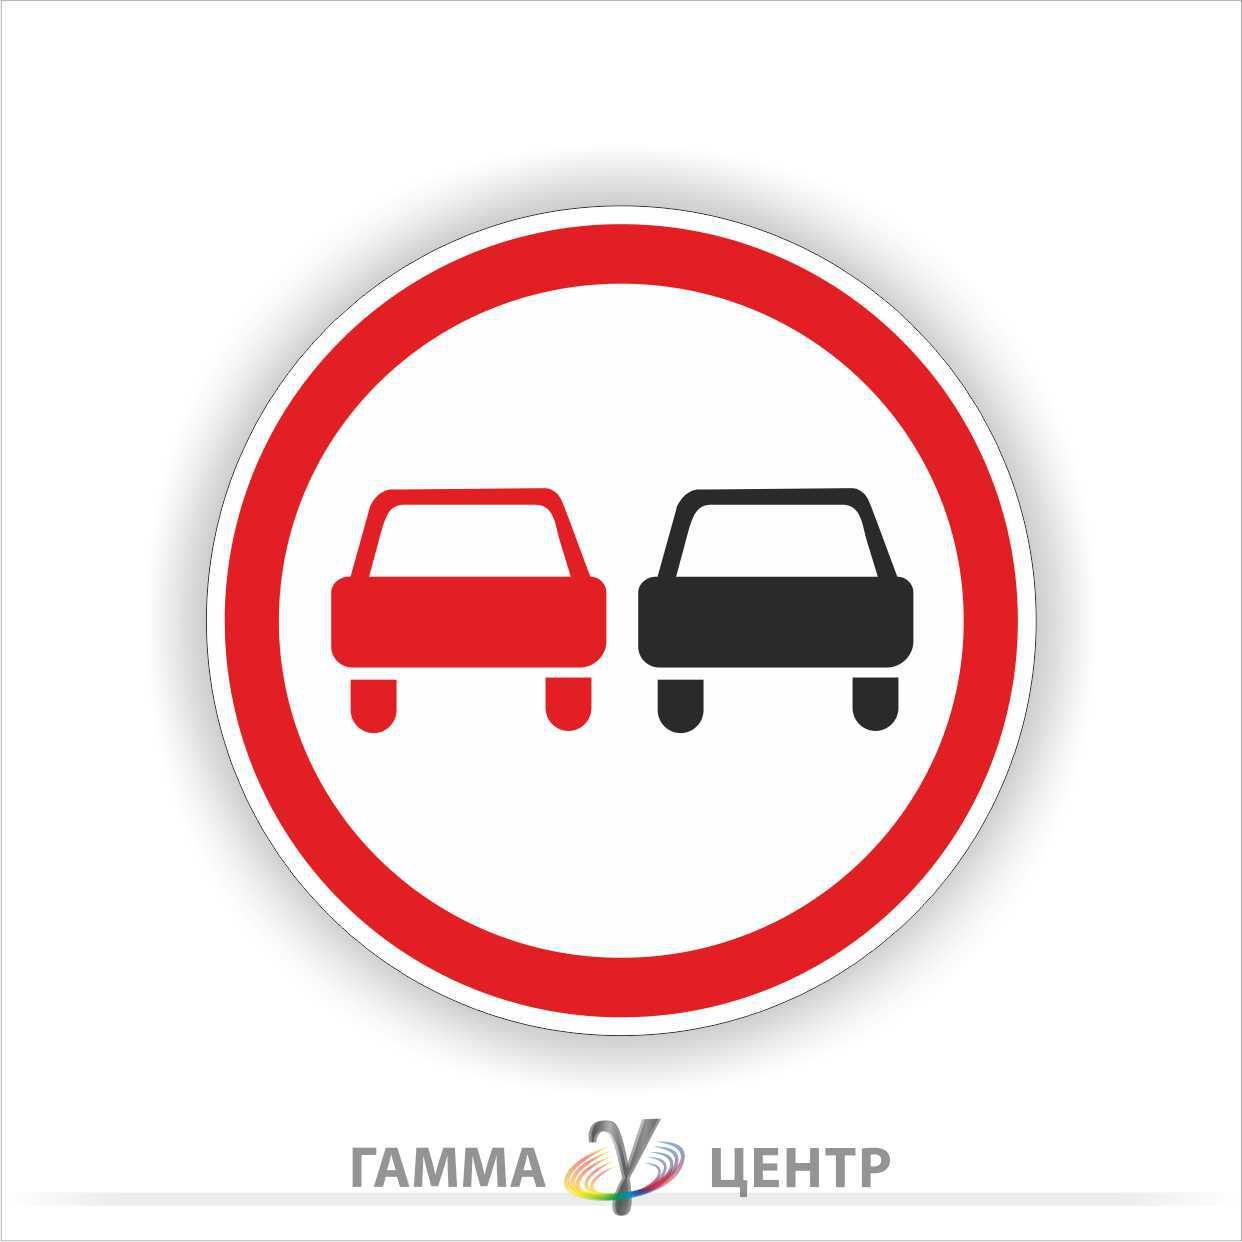 Маска дорожного знака 3.25. Обгон запрещен